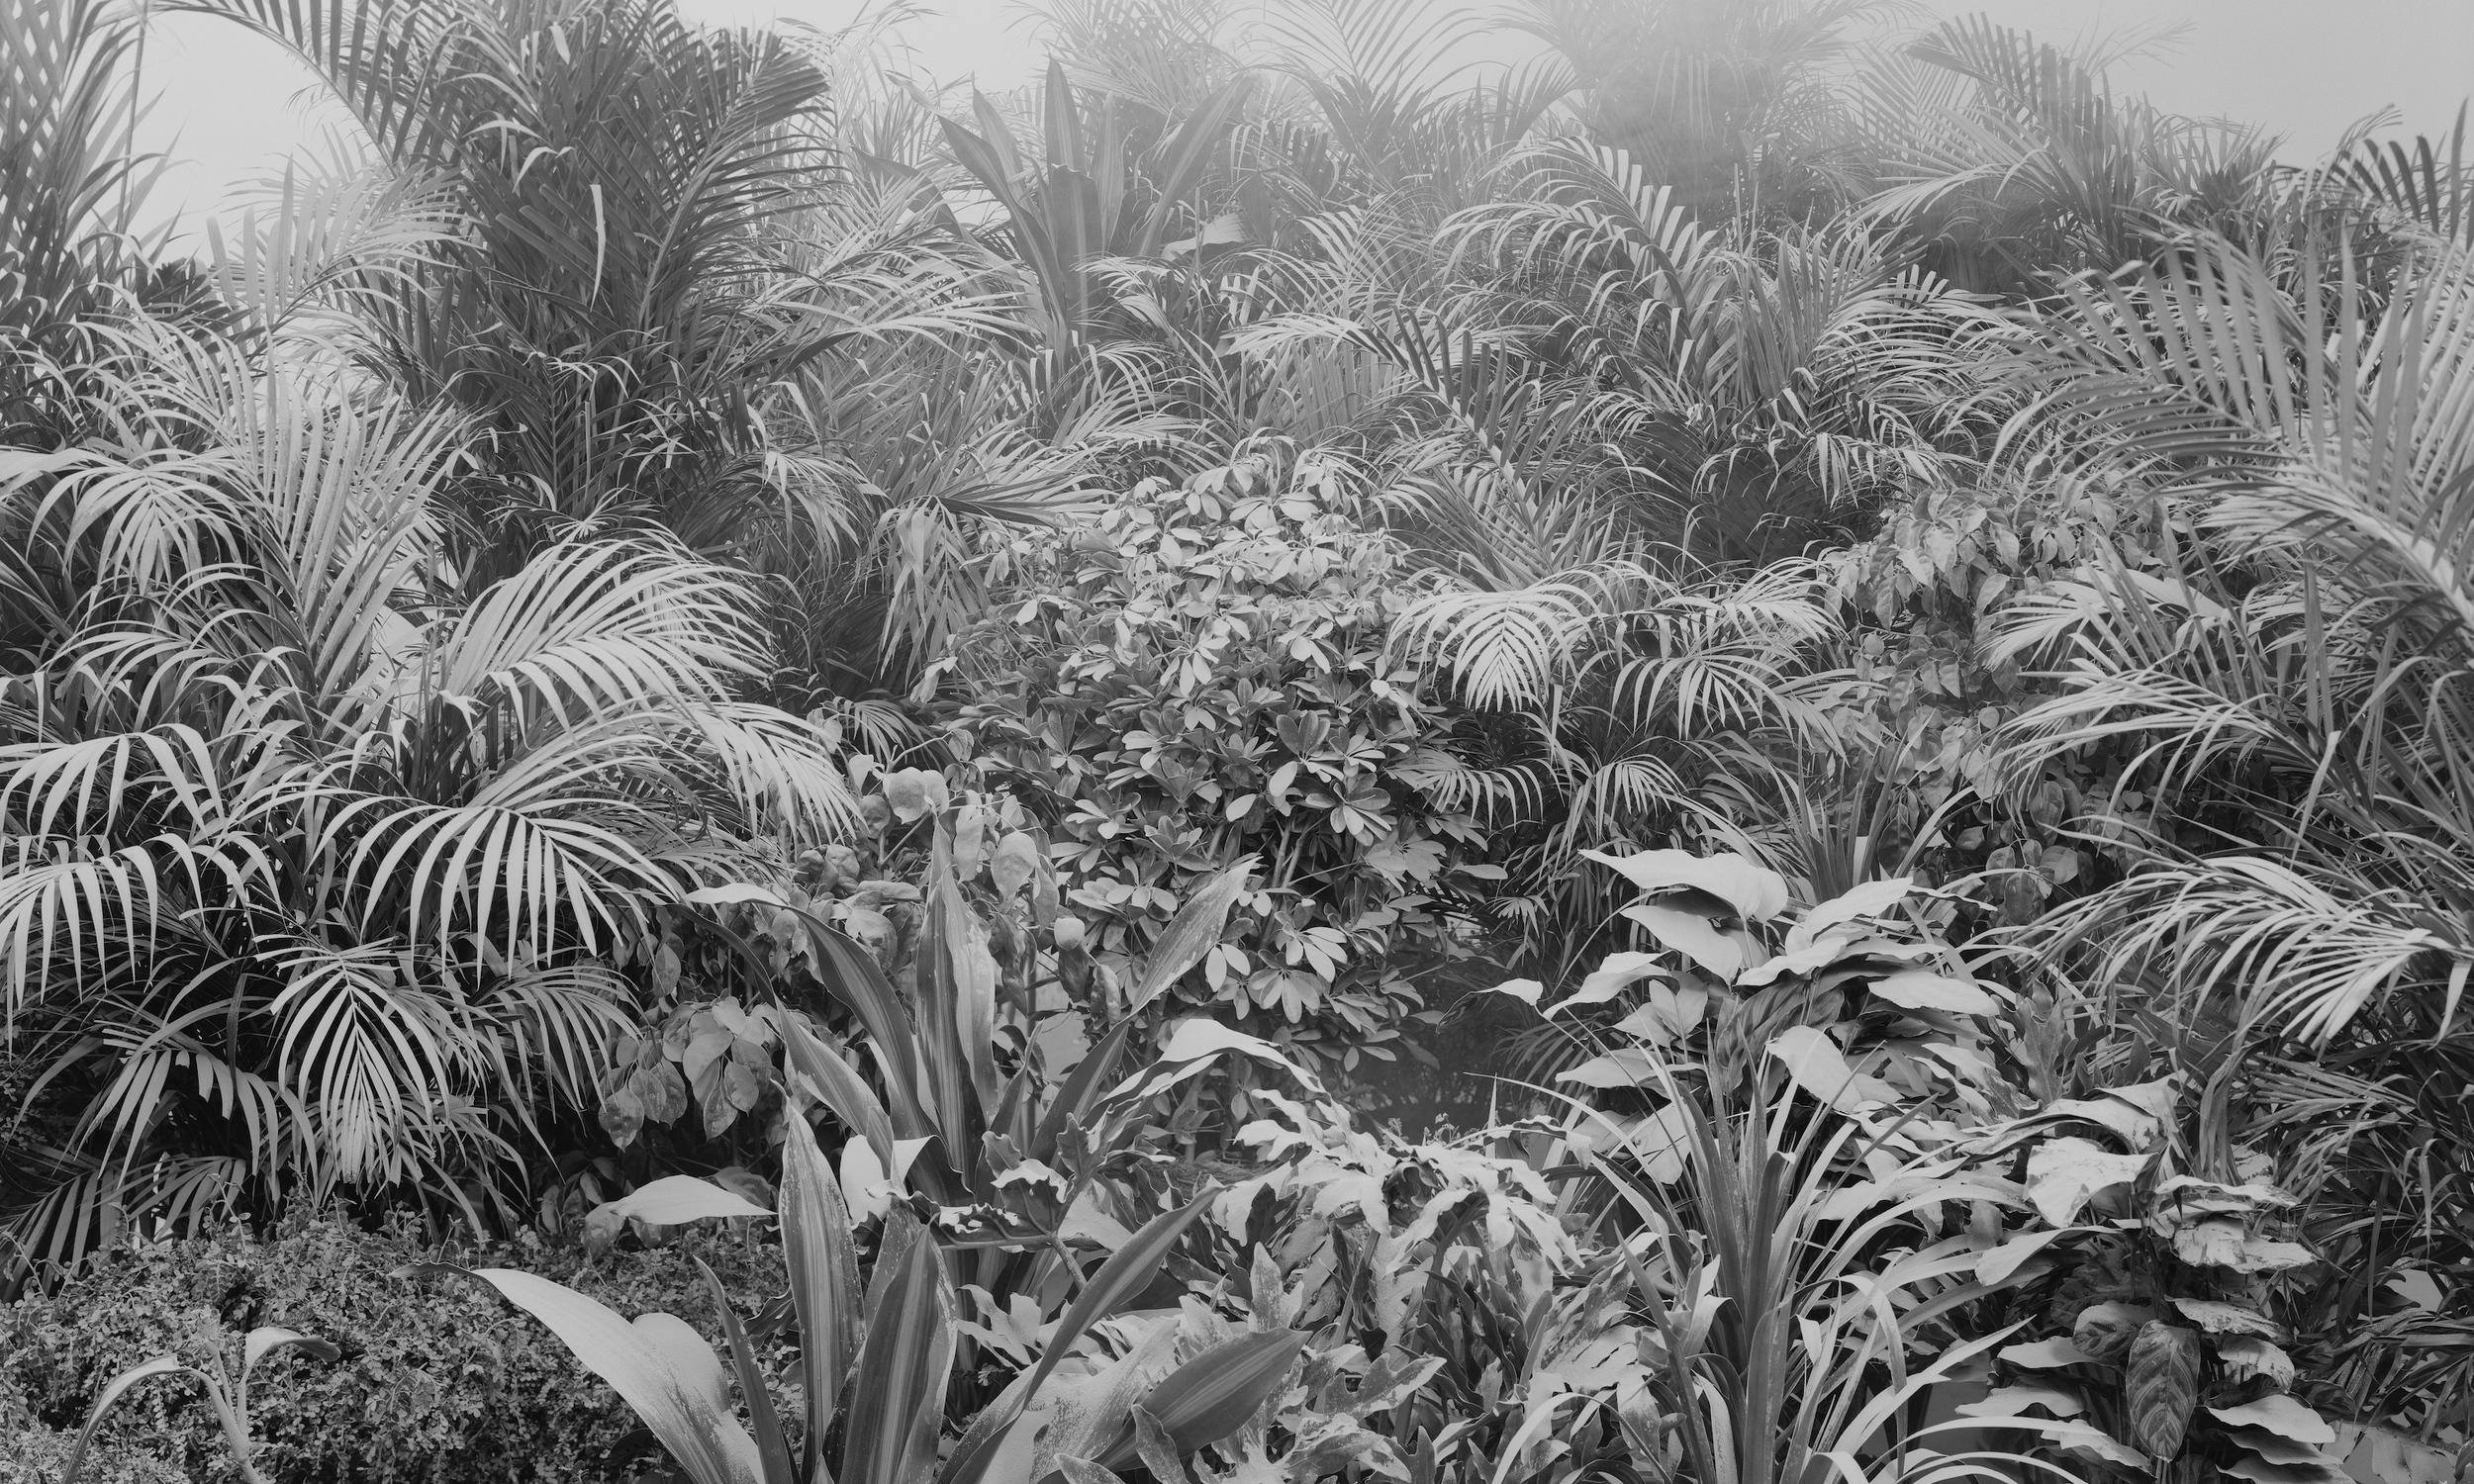 Ji Zhou 计洲, Dust No.4 尘之四, 2011, Ultra Giclee 艺术微喷, 150 x 250 cm